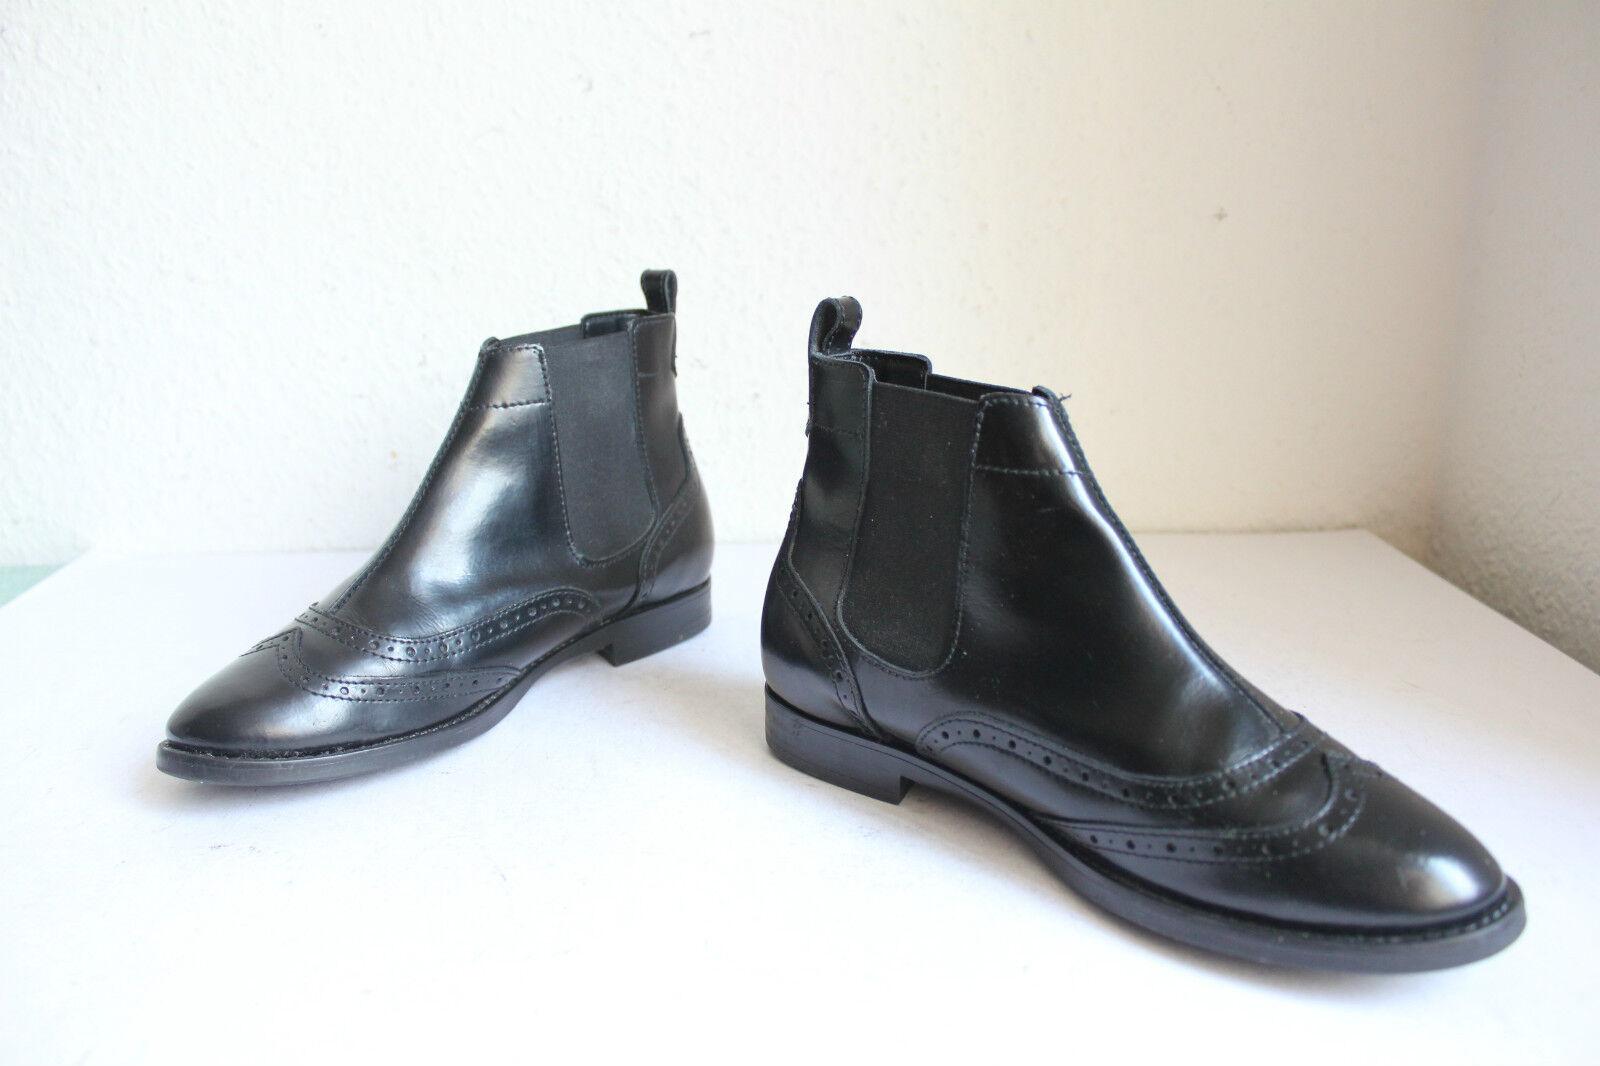 Esprit Chelsea Budapester Boots Stiefeletten Echt Lackleder Schwarz Eu:36,5-37